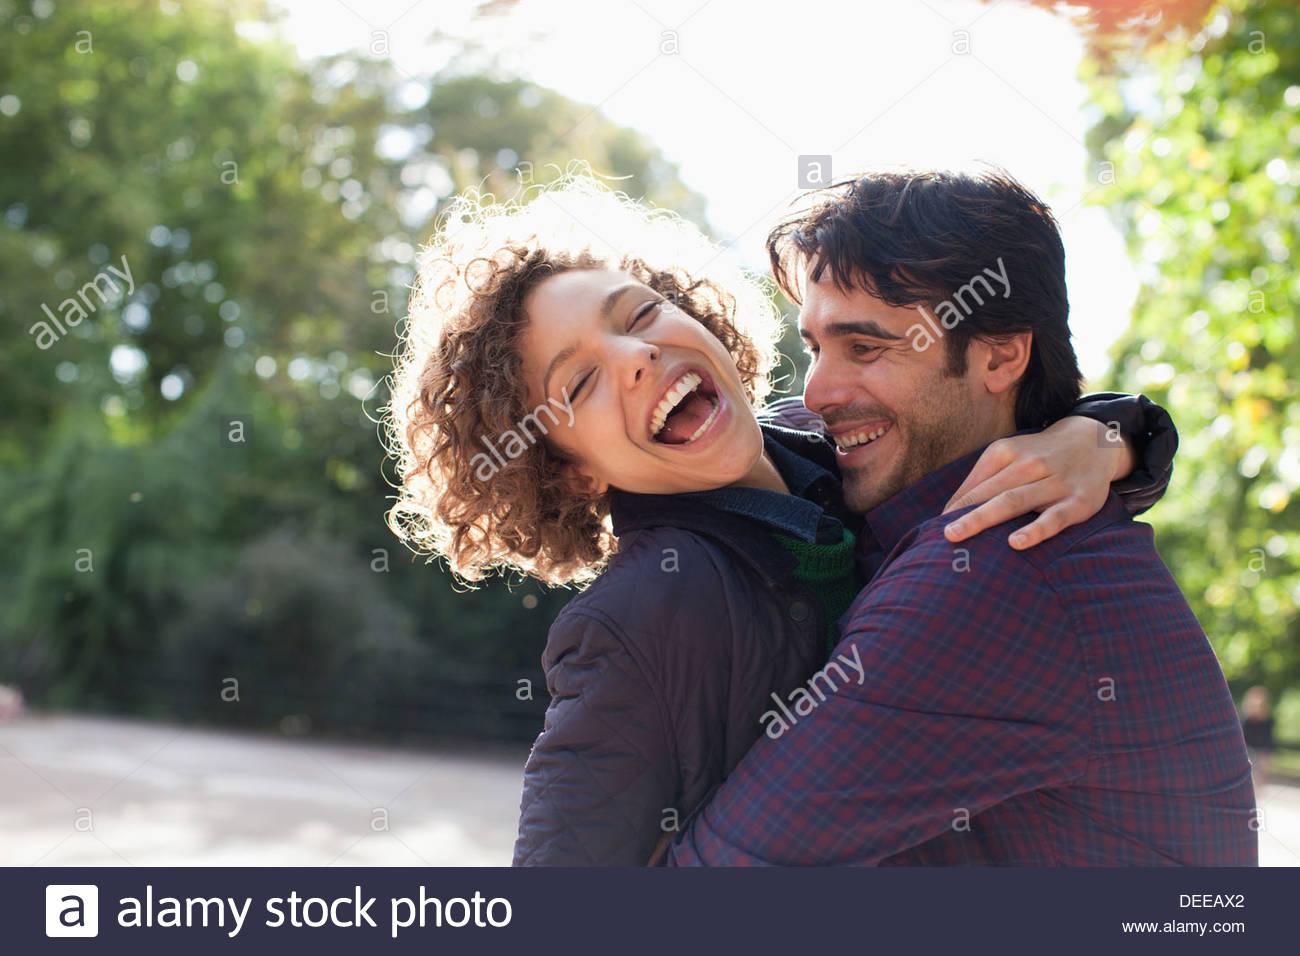 Sun shining behind happy couple hugging - Stock Image